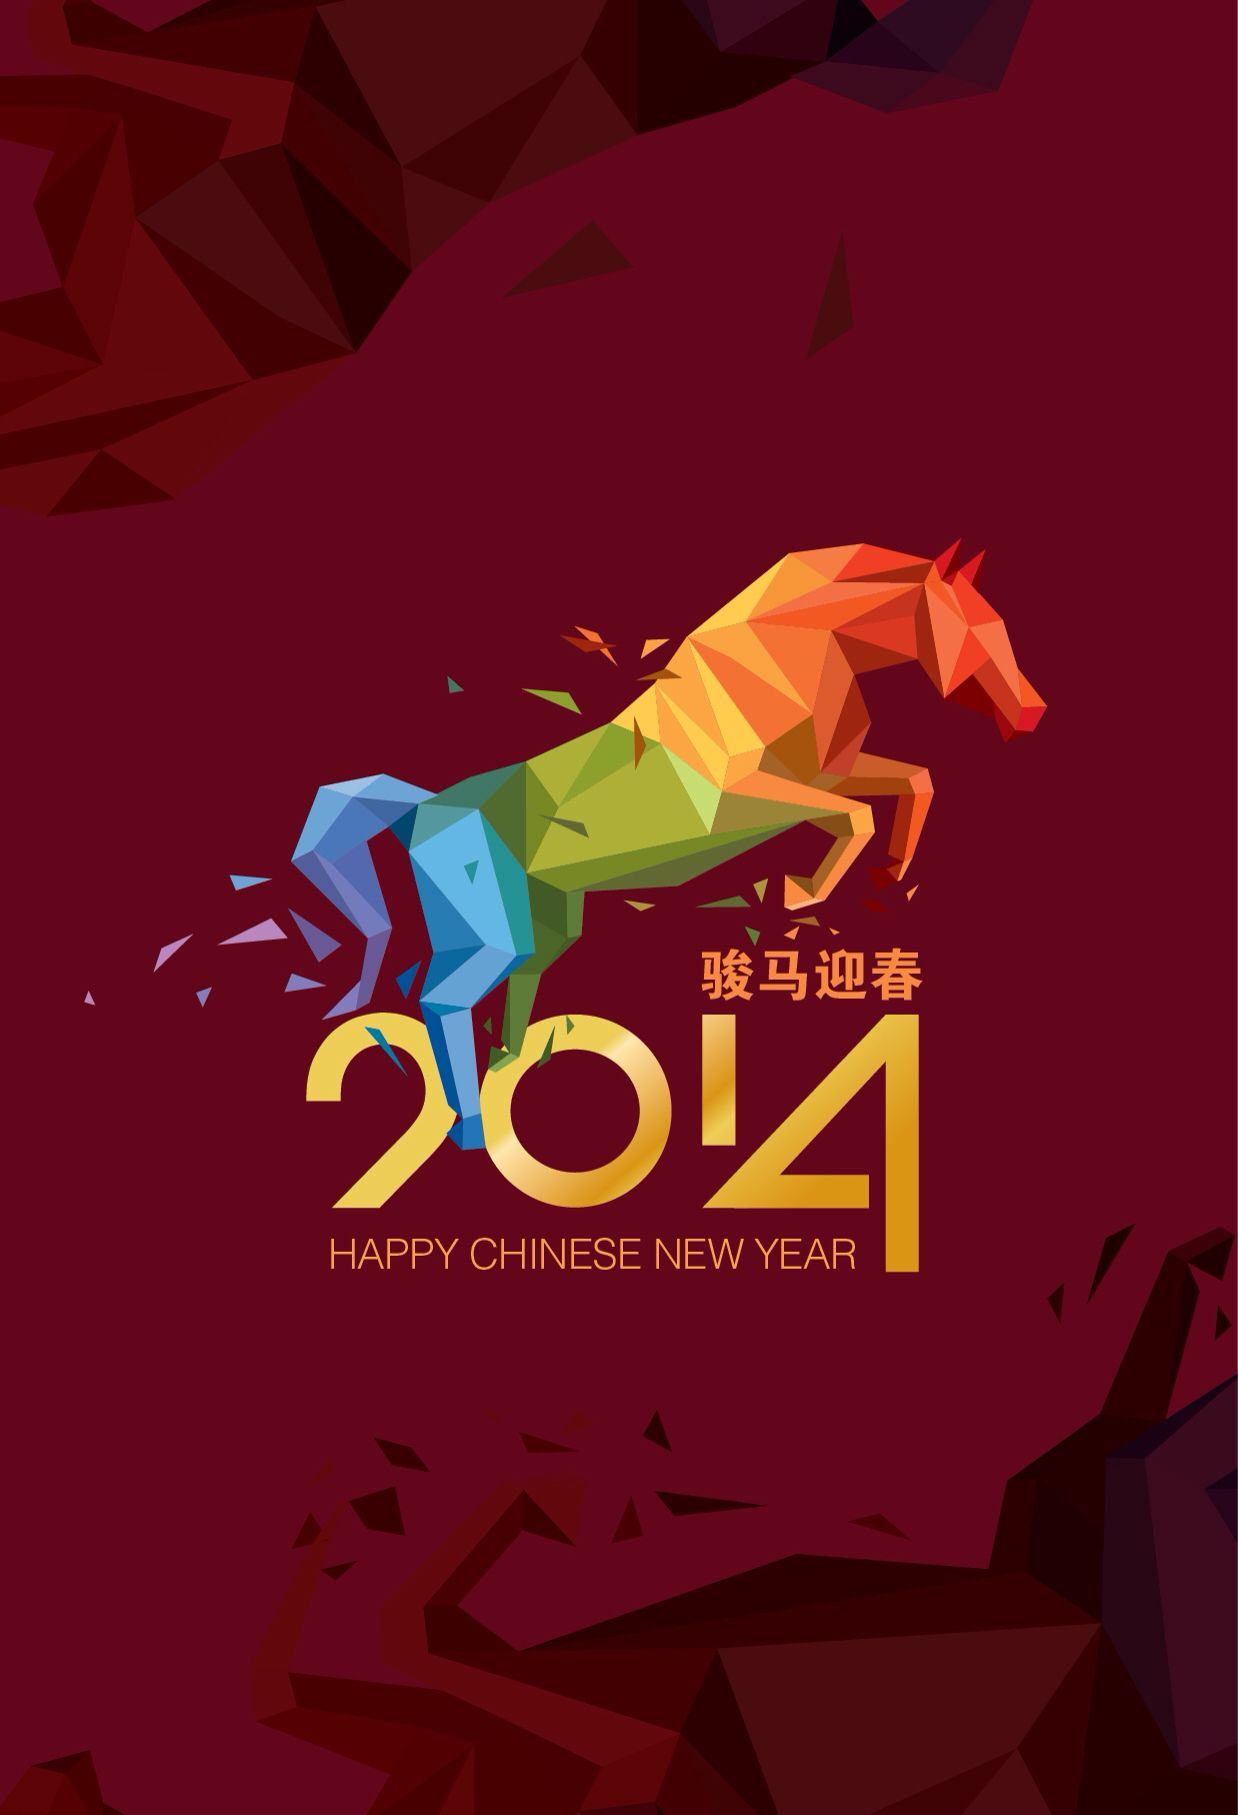 Cny 2014 horse poster design